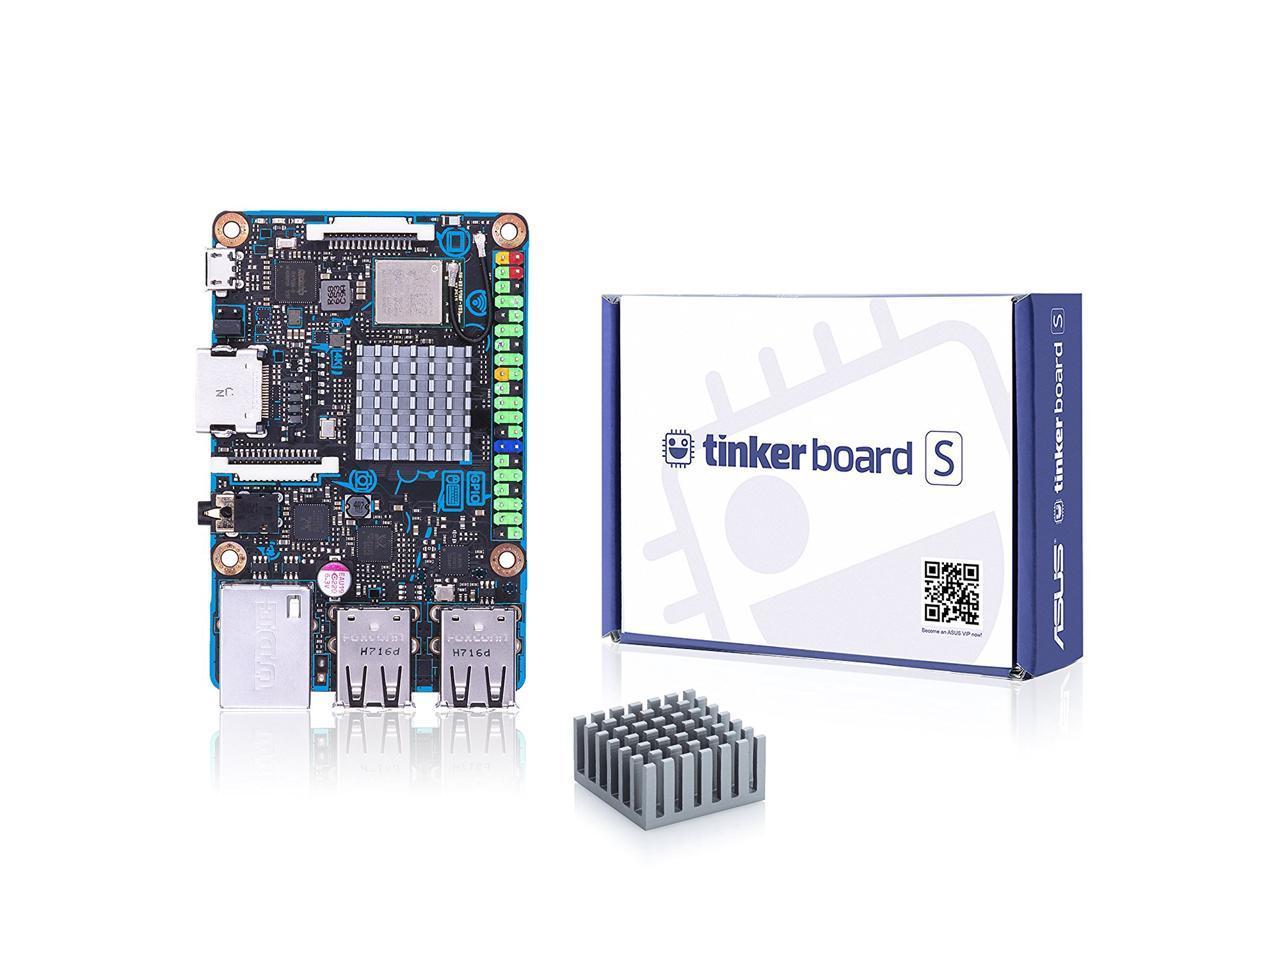 ASUS Tinker Board S Quad-Core 1 8 GHz SoC 2GB RAM